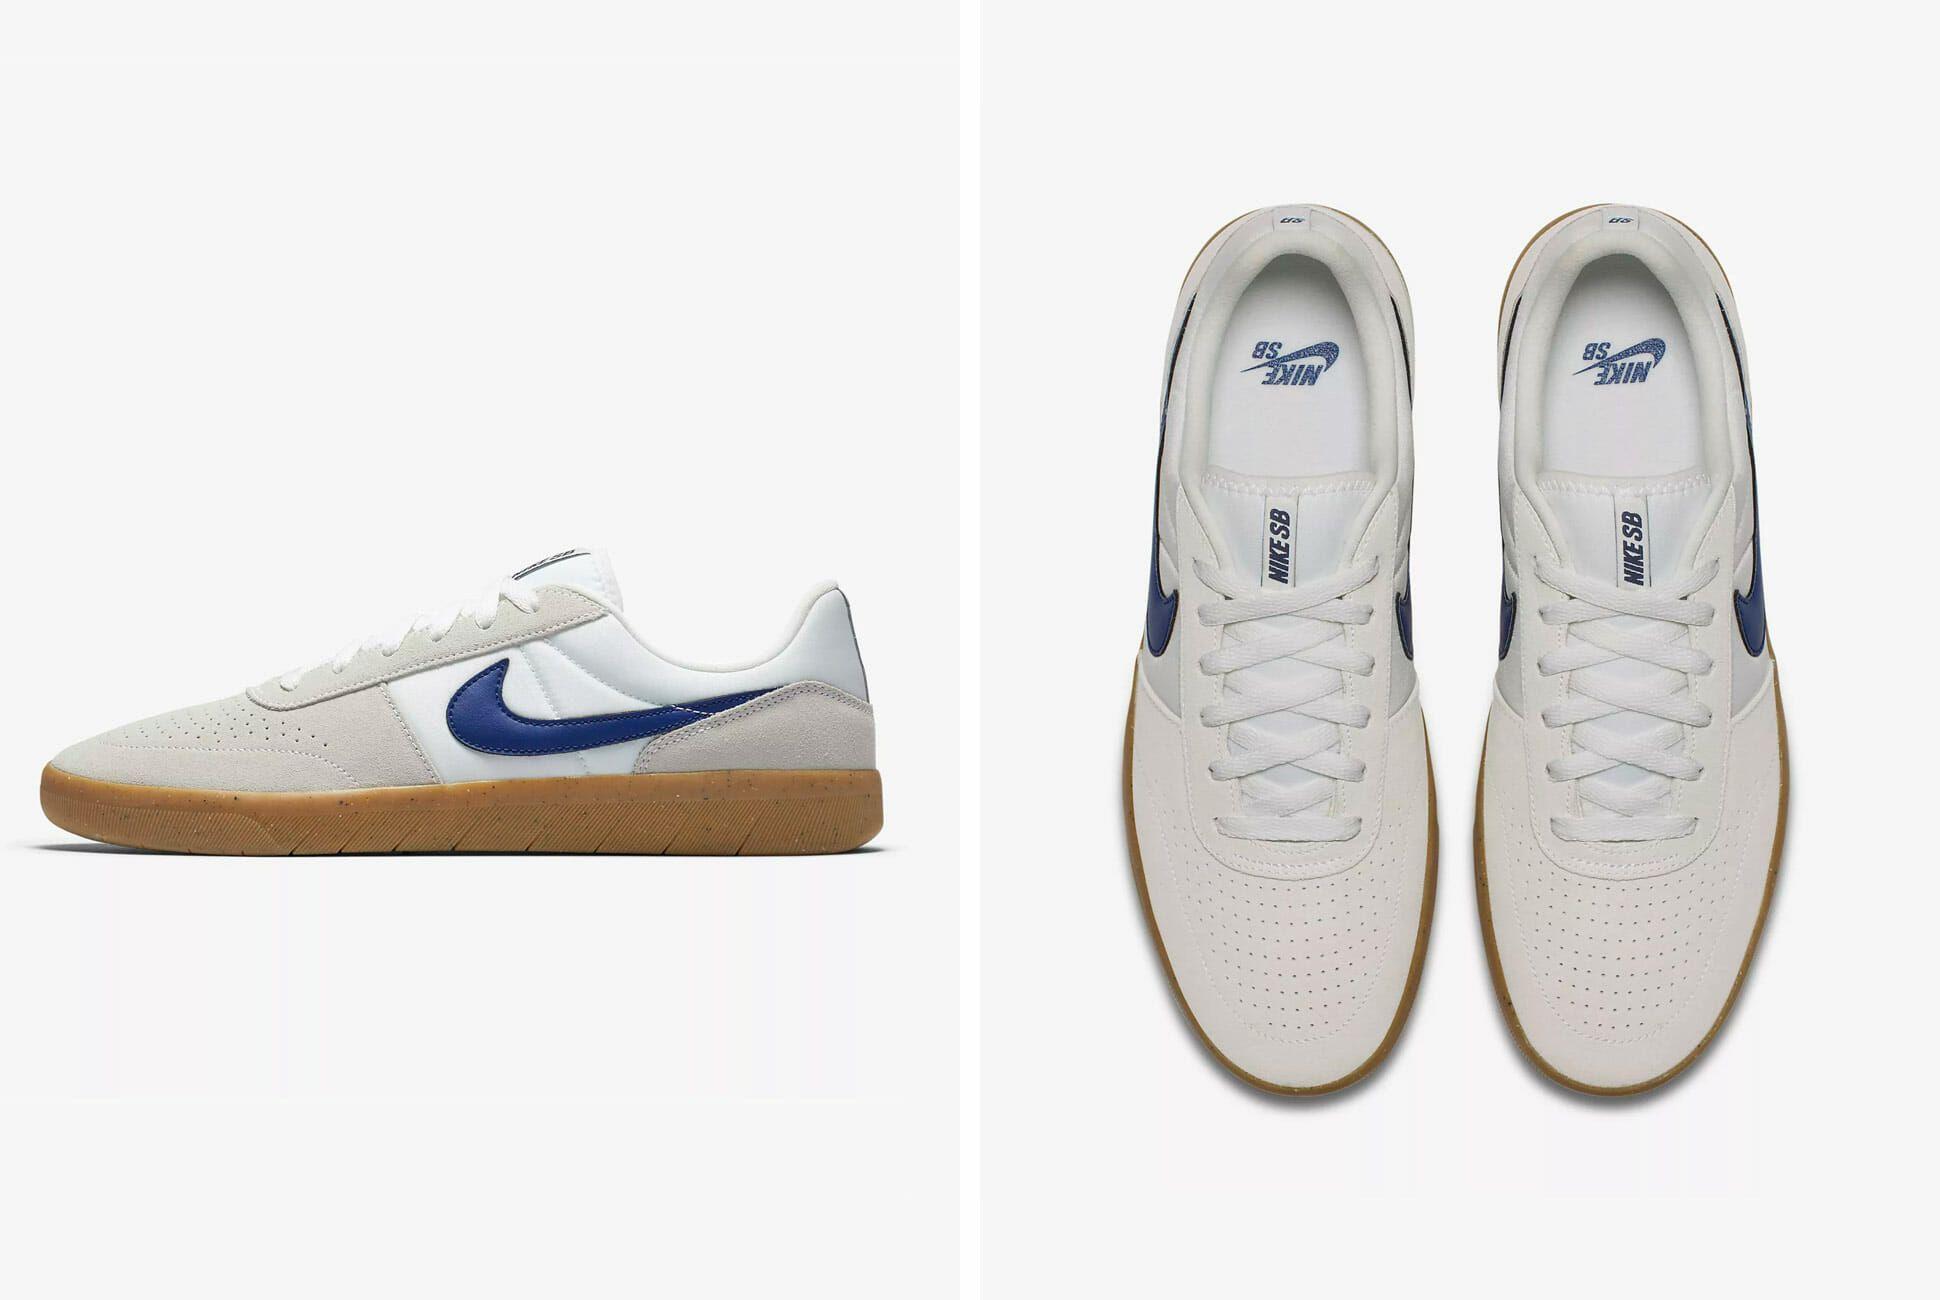 These Nike SB's Look Like Killshots at Just Half the Price